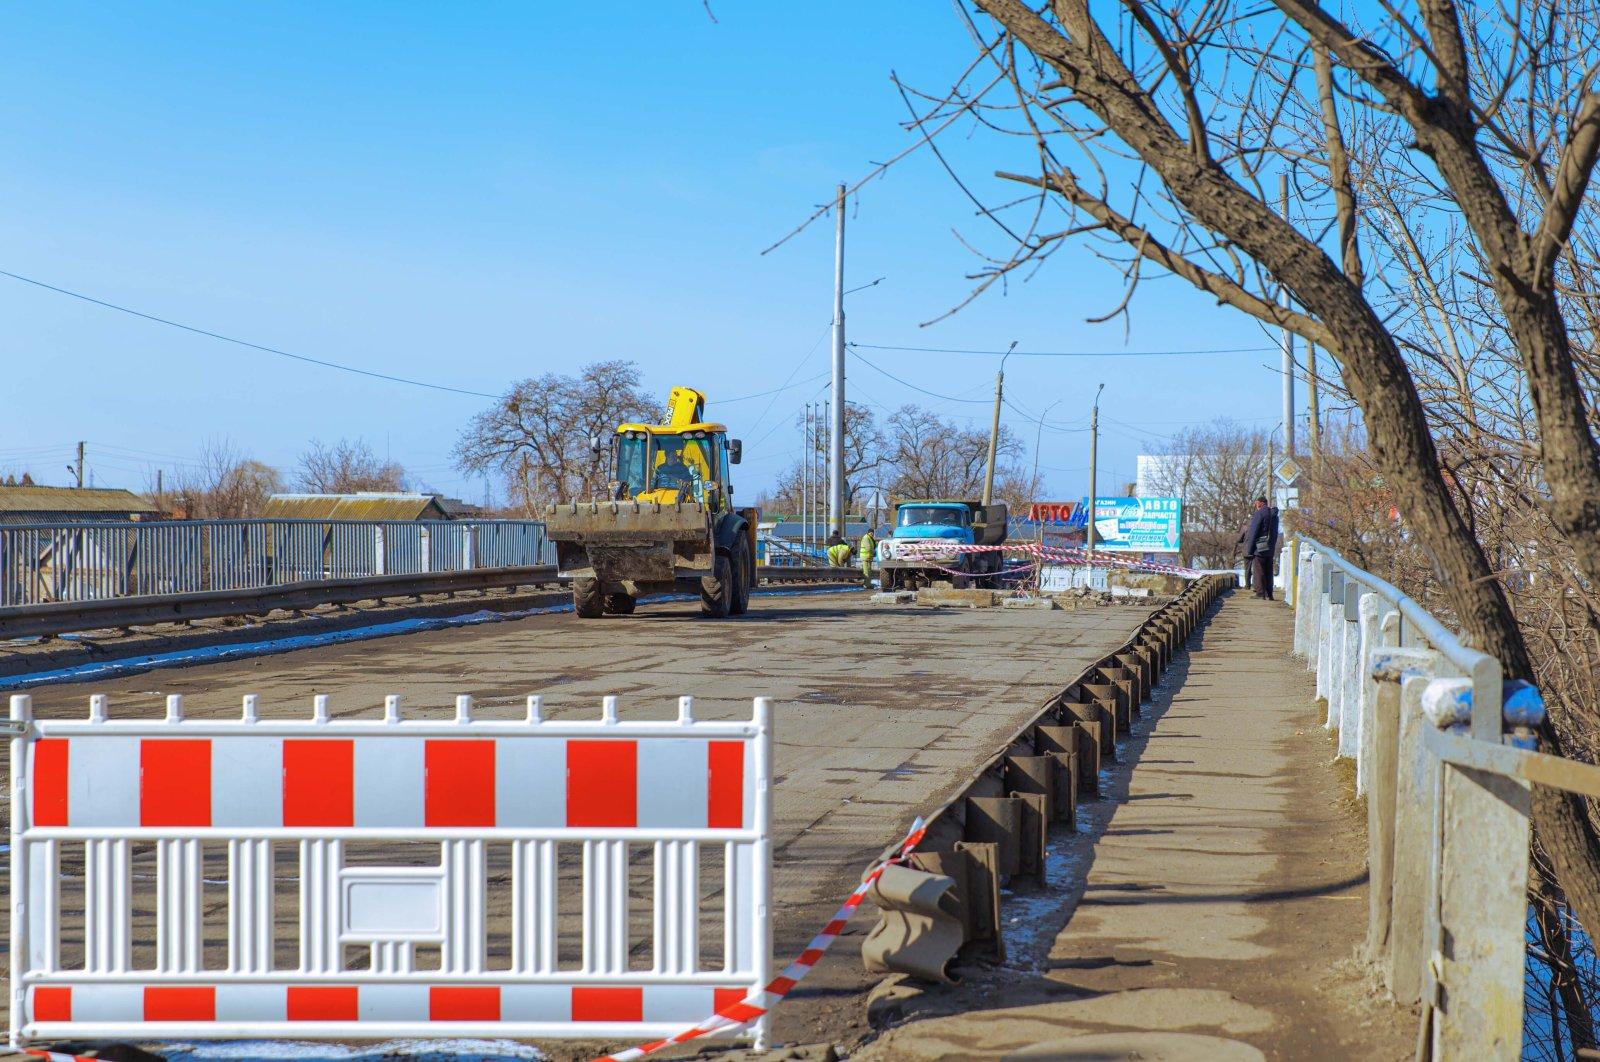 Renovation work is carried out on a bridge in Sloviansk, Ukraine, March 10, 2021. (Shutterstock Photo)